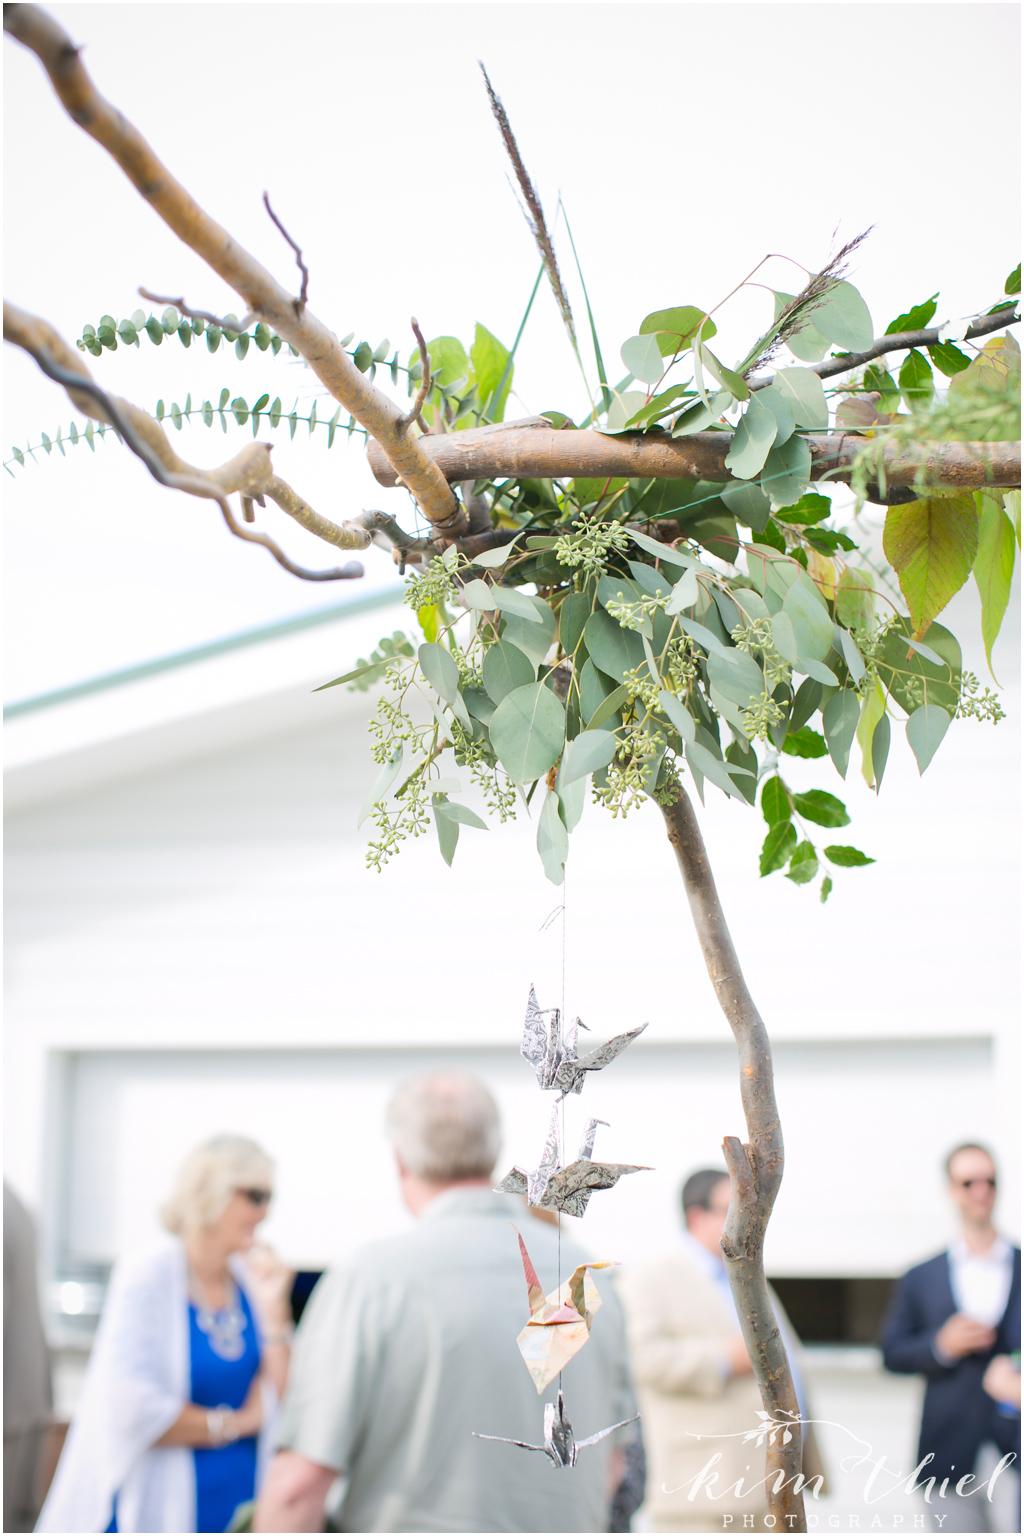 Kim-Thiel-Photography-Horseshoe-Bay-Beach-Club-Wedding-55